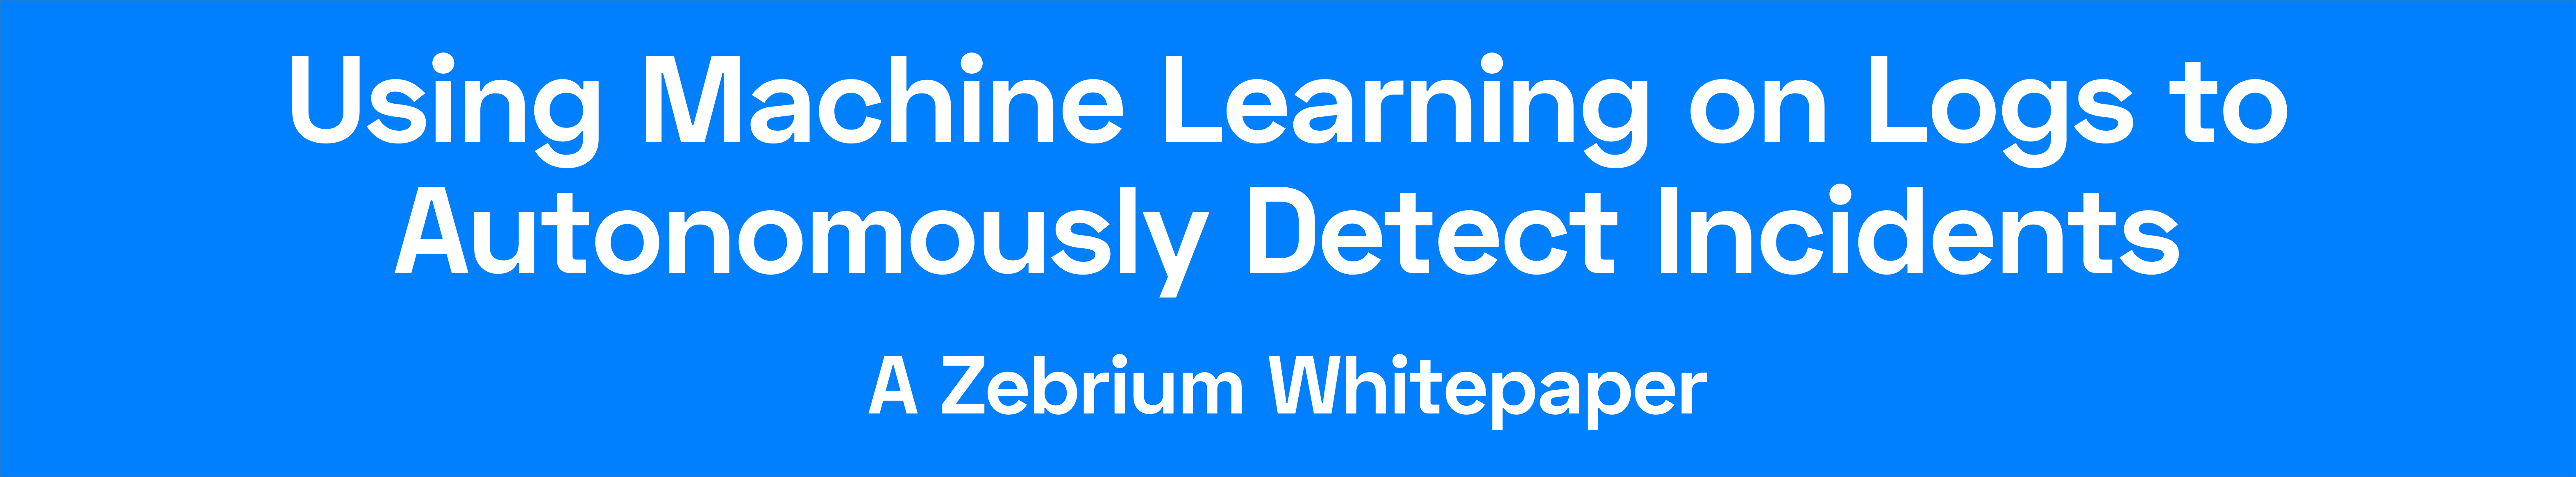 A Zebrium Whitepaper - Using ML on logs